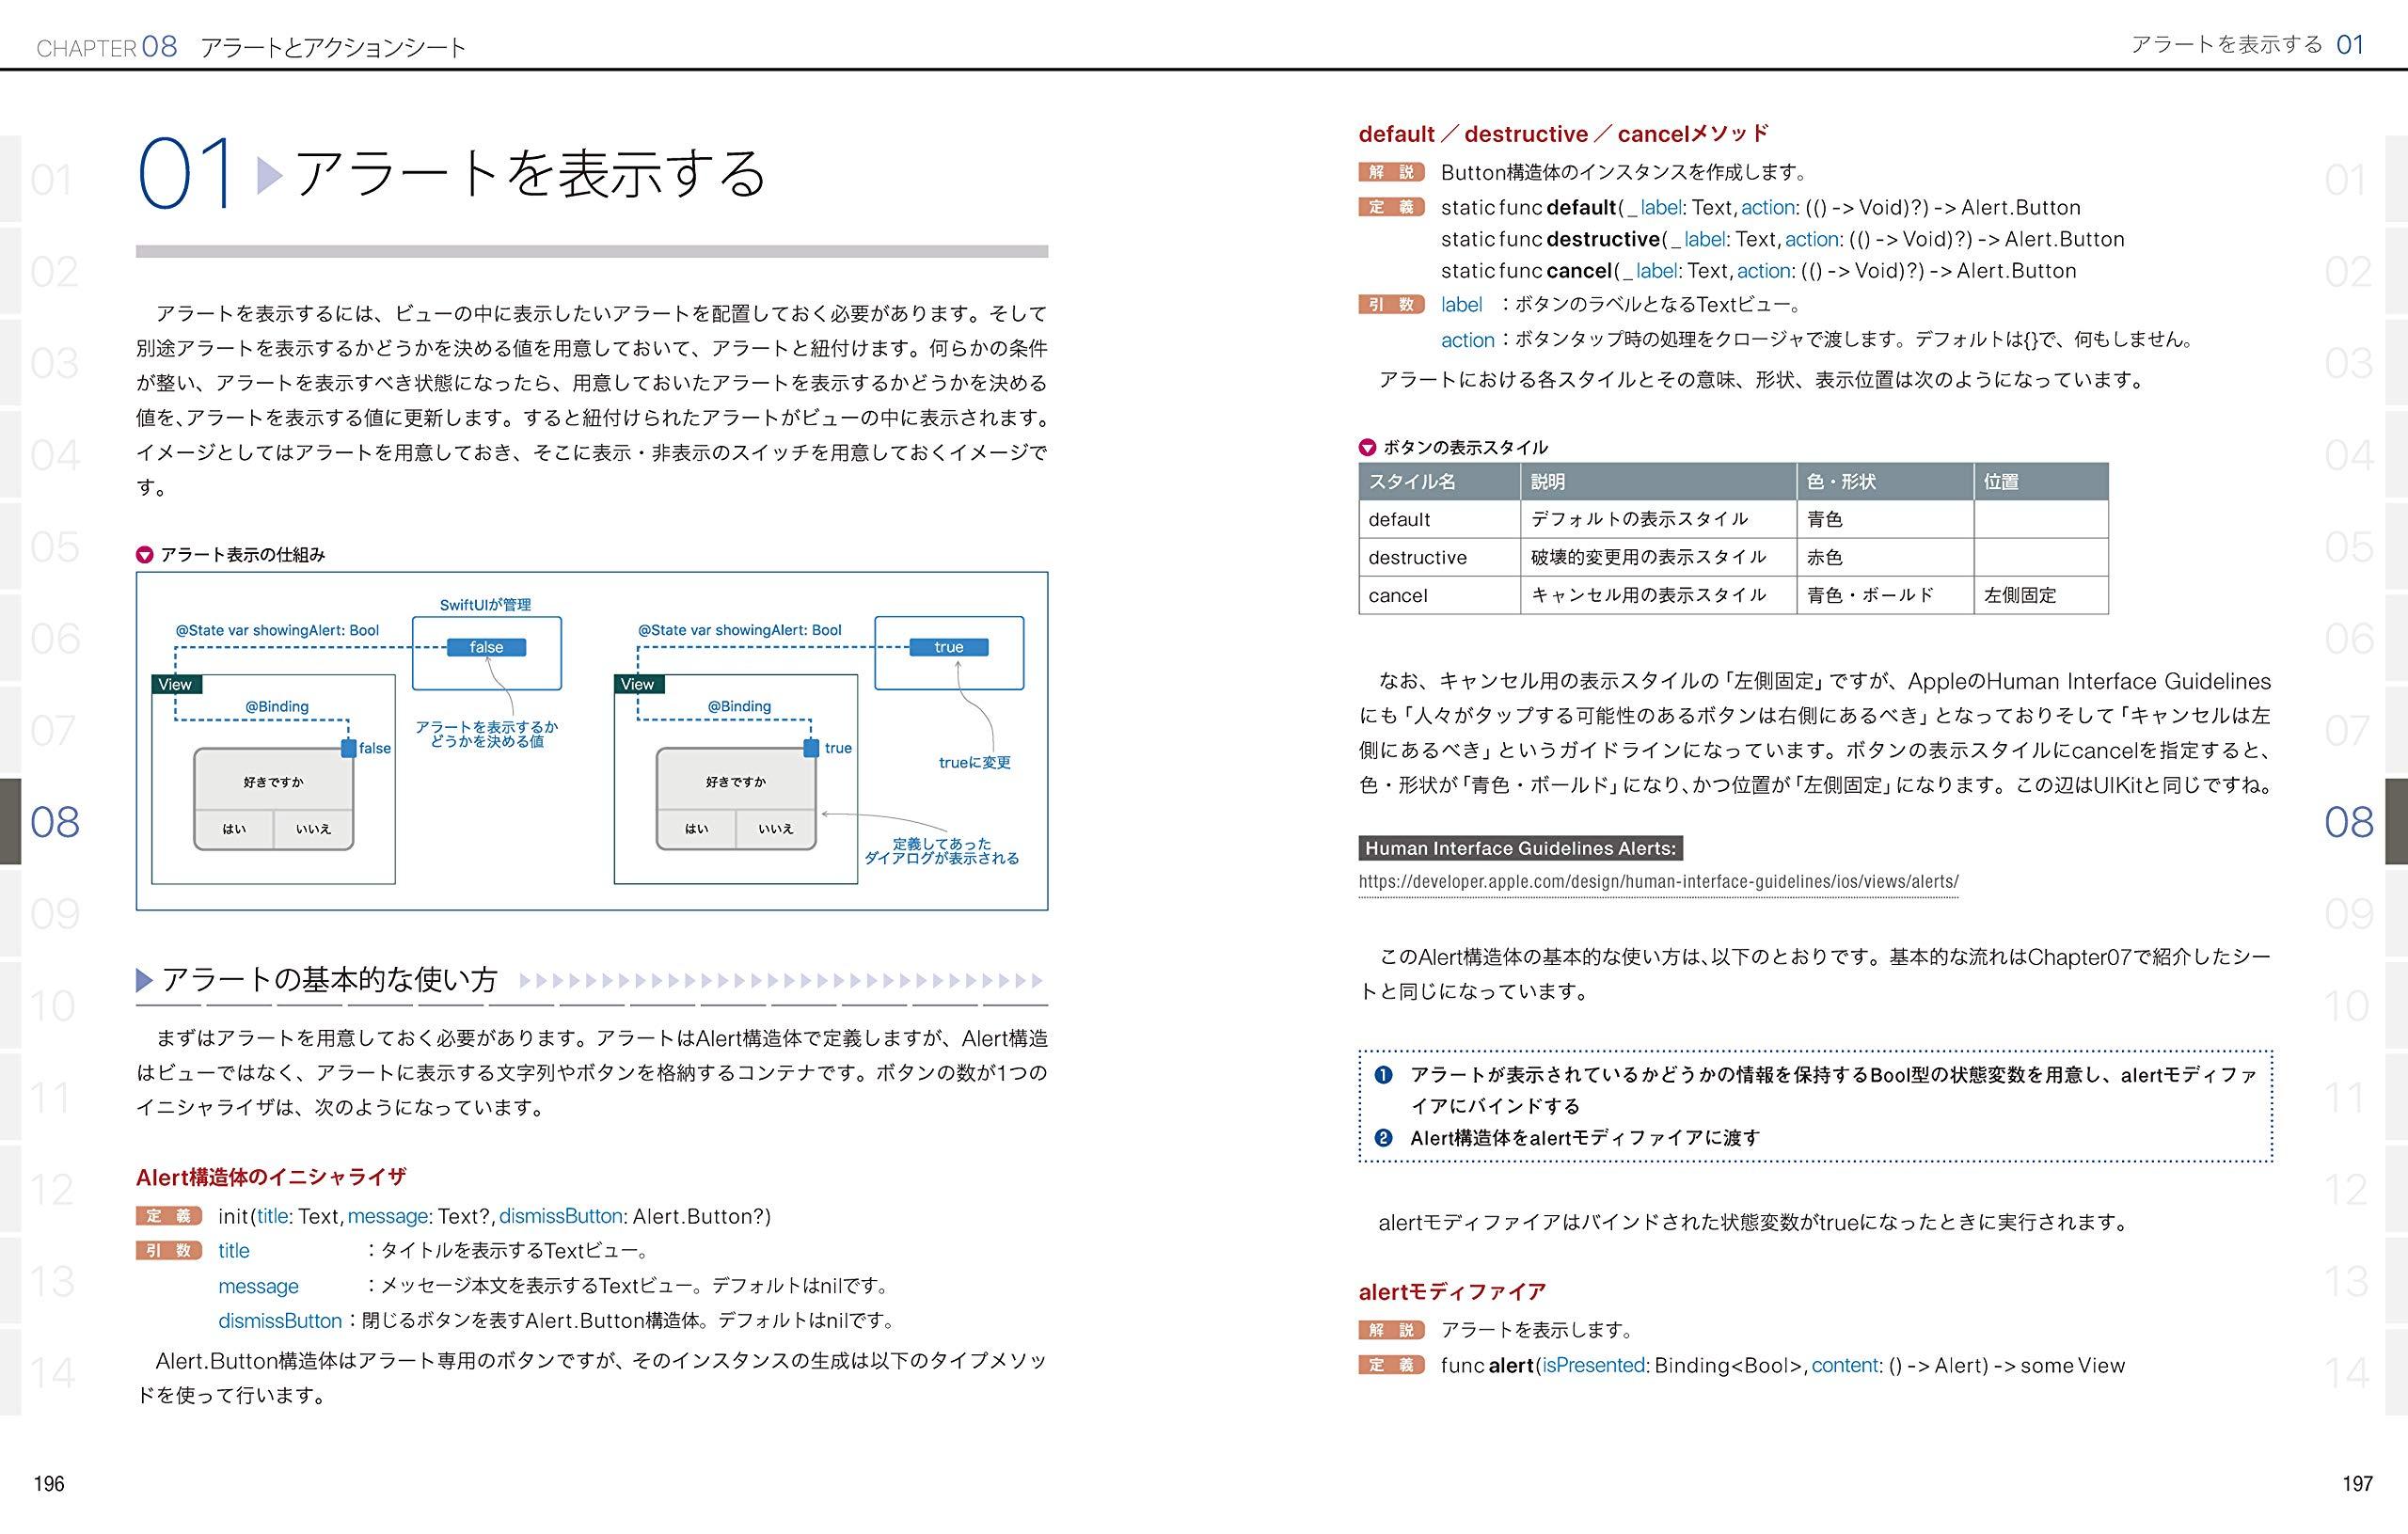 Thumbnail of SwiftUI 徹底入門4$